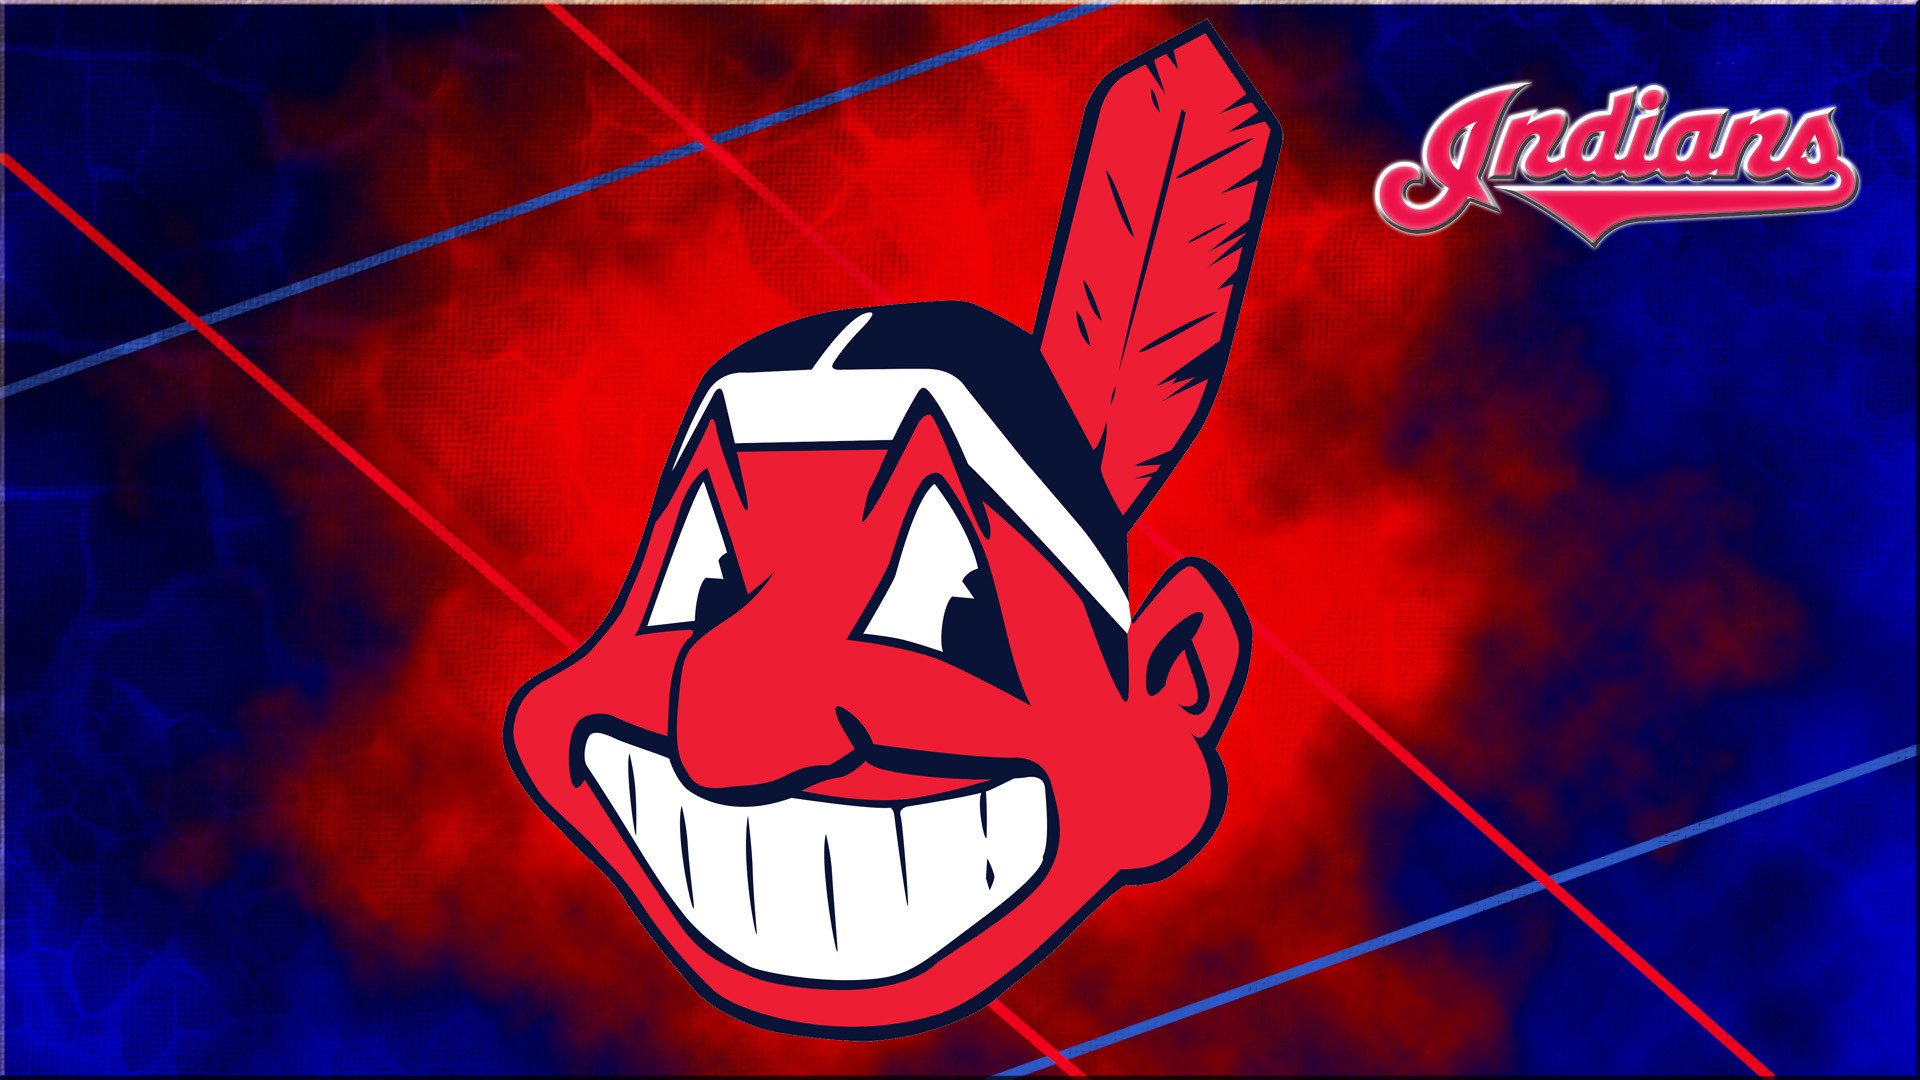 Cleveland Indians Wallpaper Screensaver